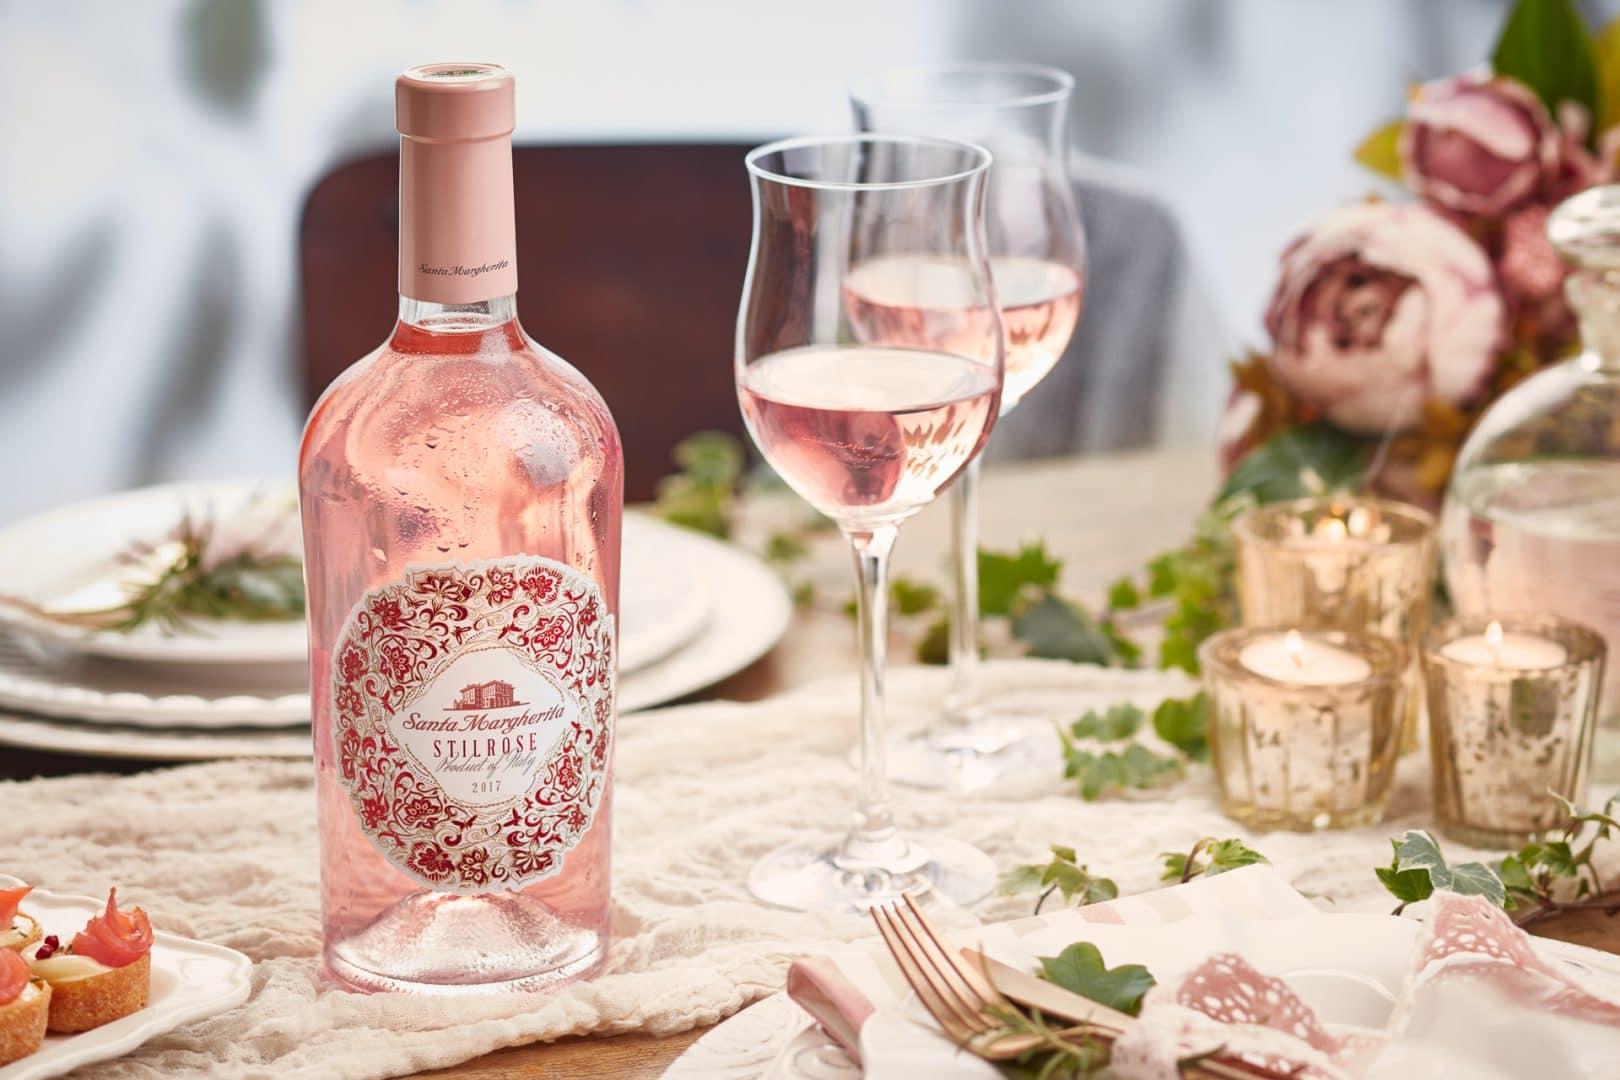 Santa Margherita - fotografo vino valdobbiadene cormons collio milano toscana venezia